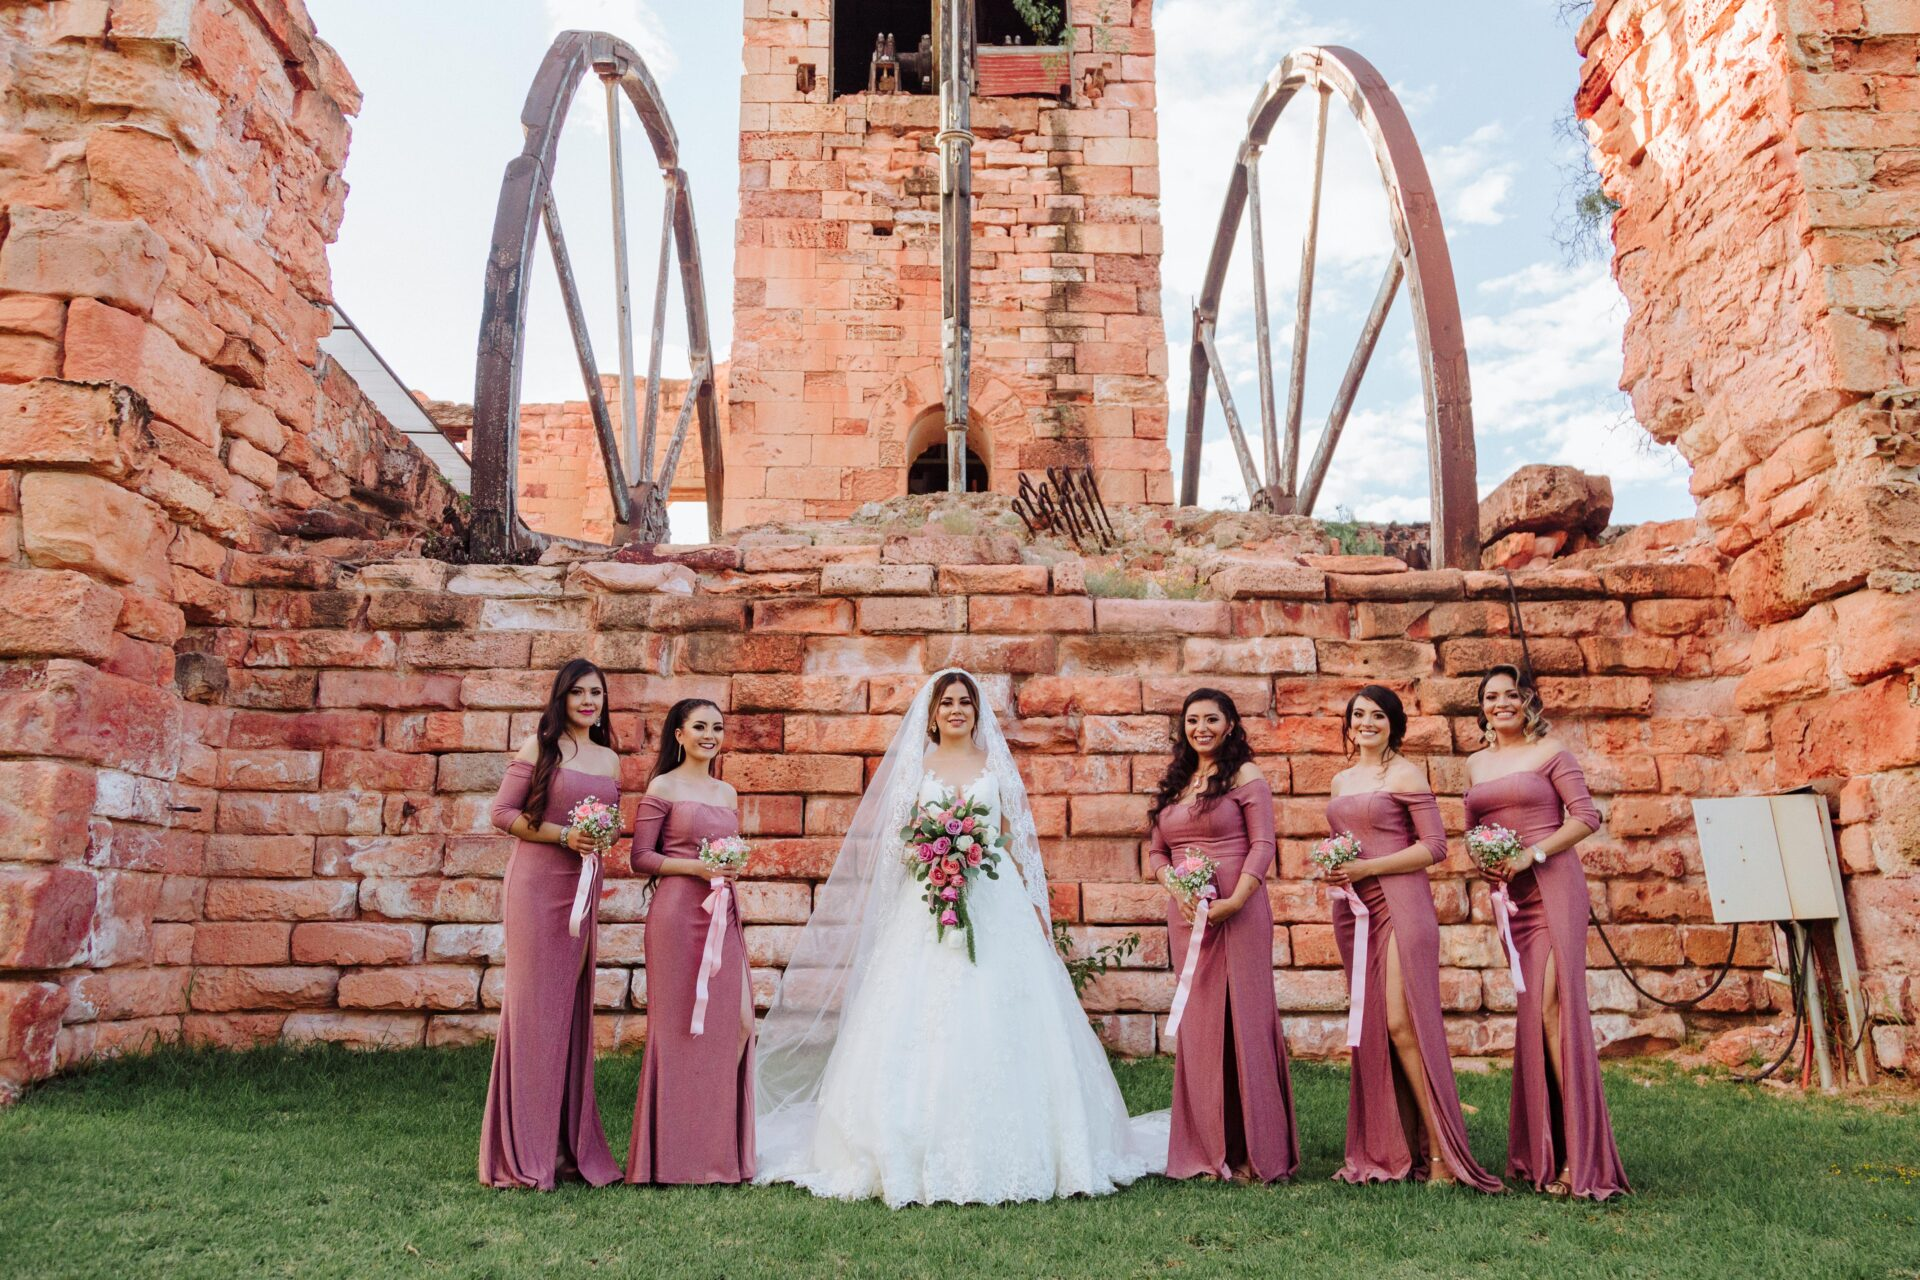 javier_noriega_fotografo_bodas_zacatecas_fresnillo_chihuahua_wedding_photographer15